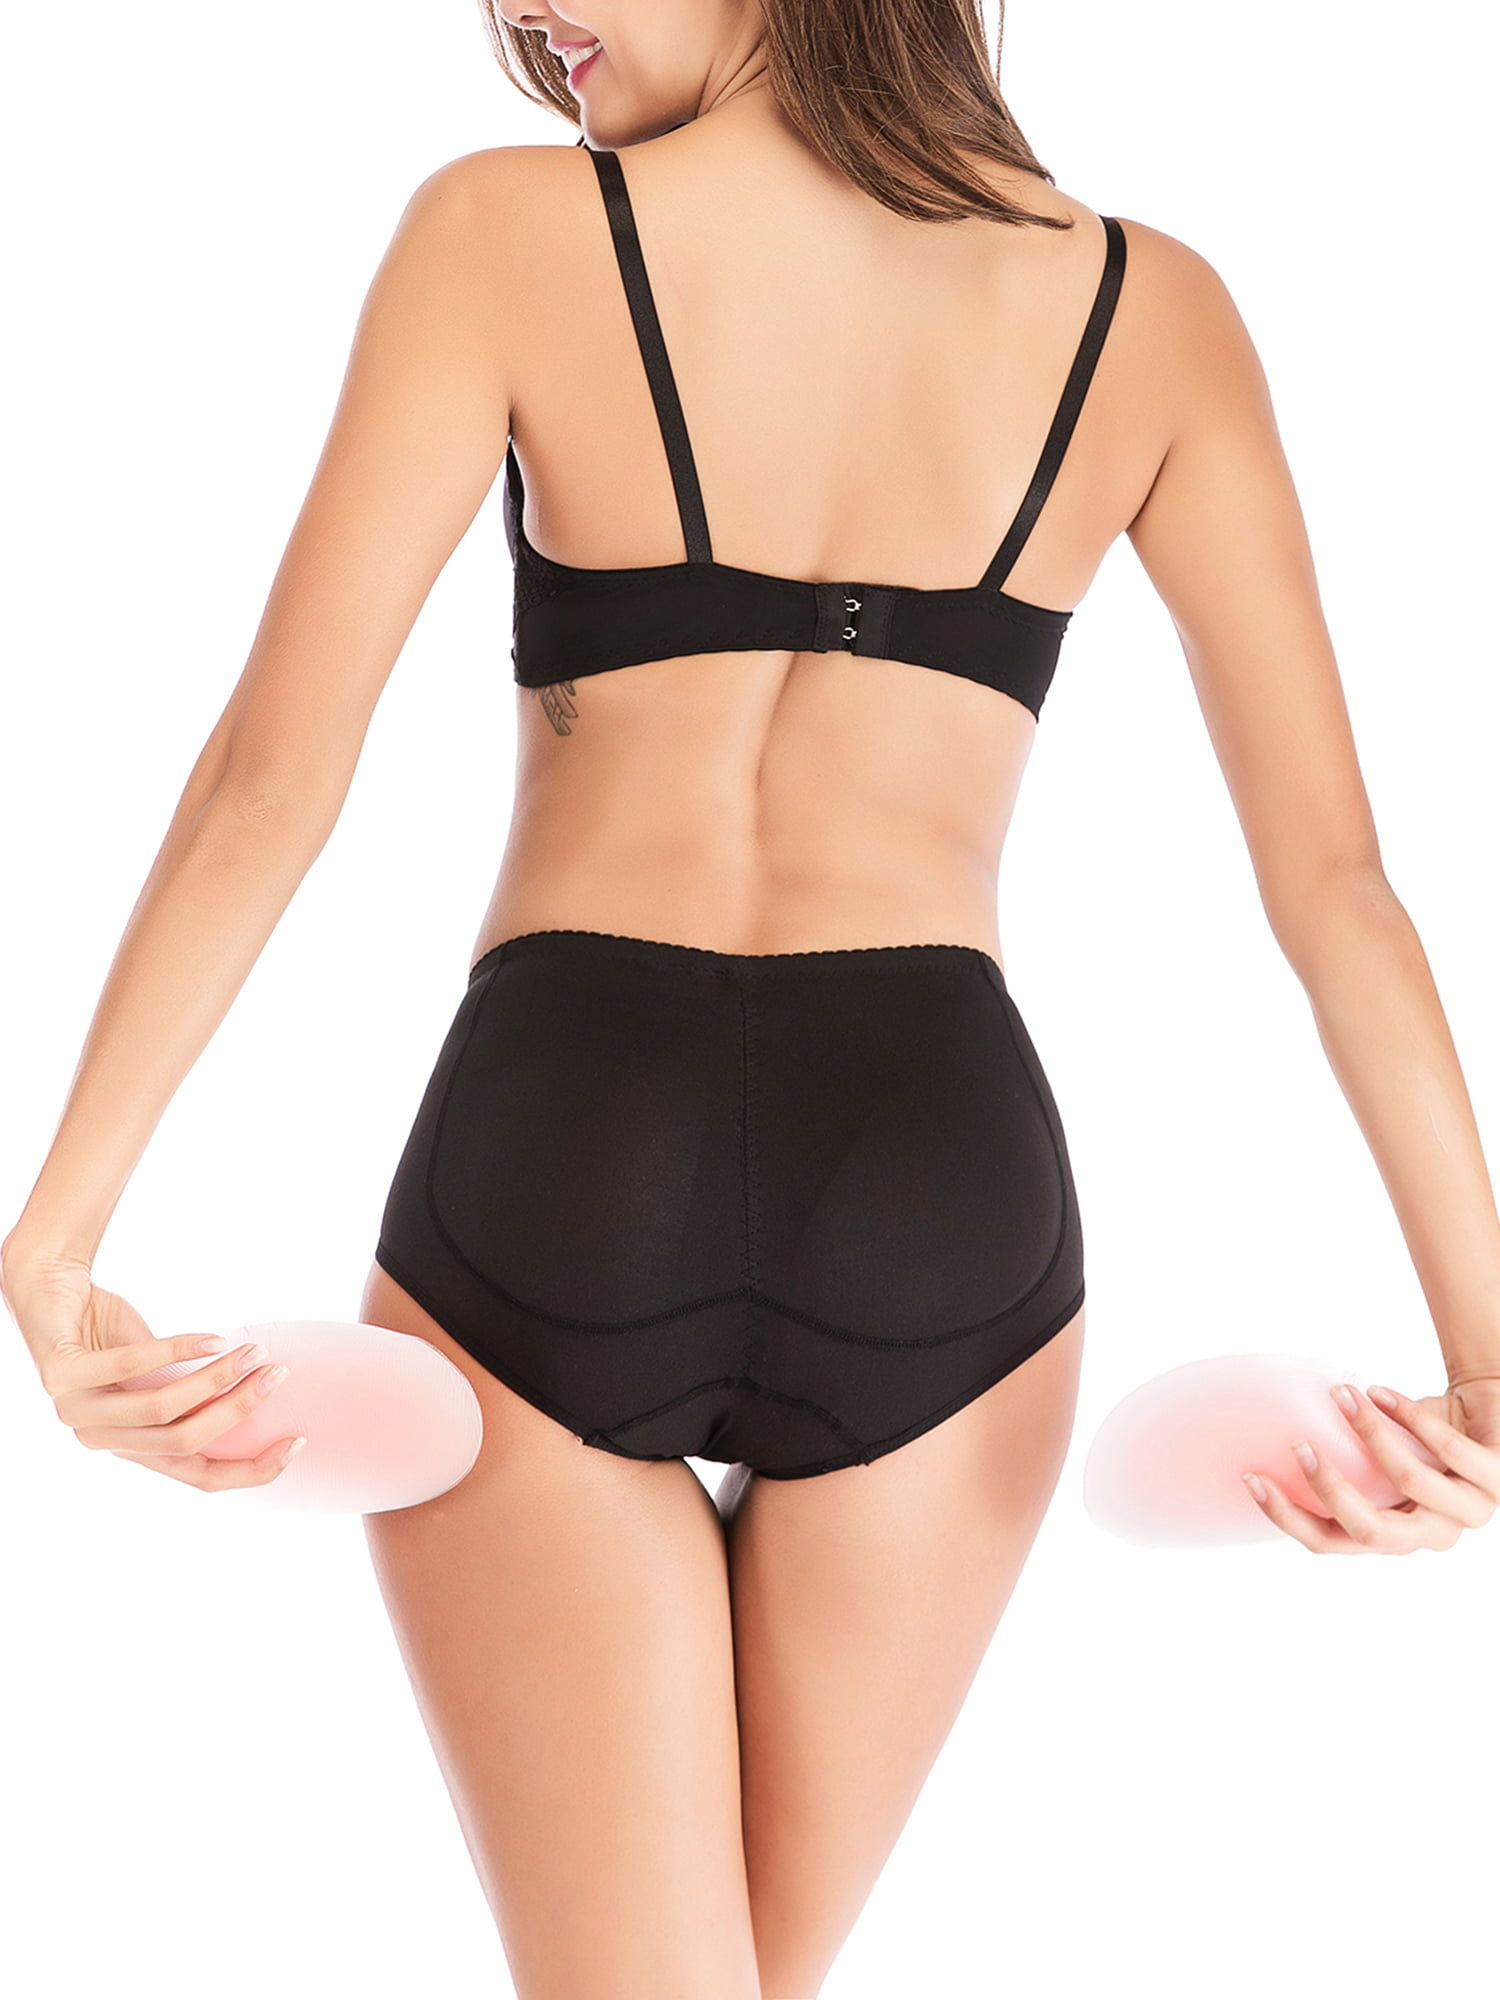 545b31ef3f95 Lelinta - Women Padded Underwear Seamless Butt Lifter Hip Enhancer Body  Shaper Slimming Silicone Butt Hip Pads Sexy Buttock Panty - Walmart.com